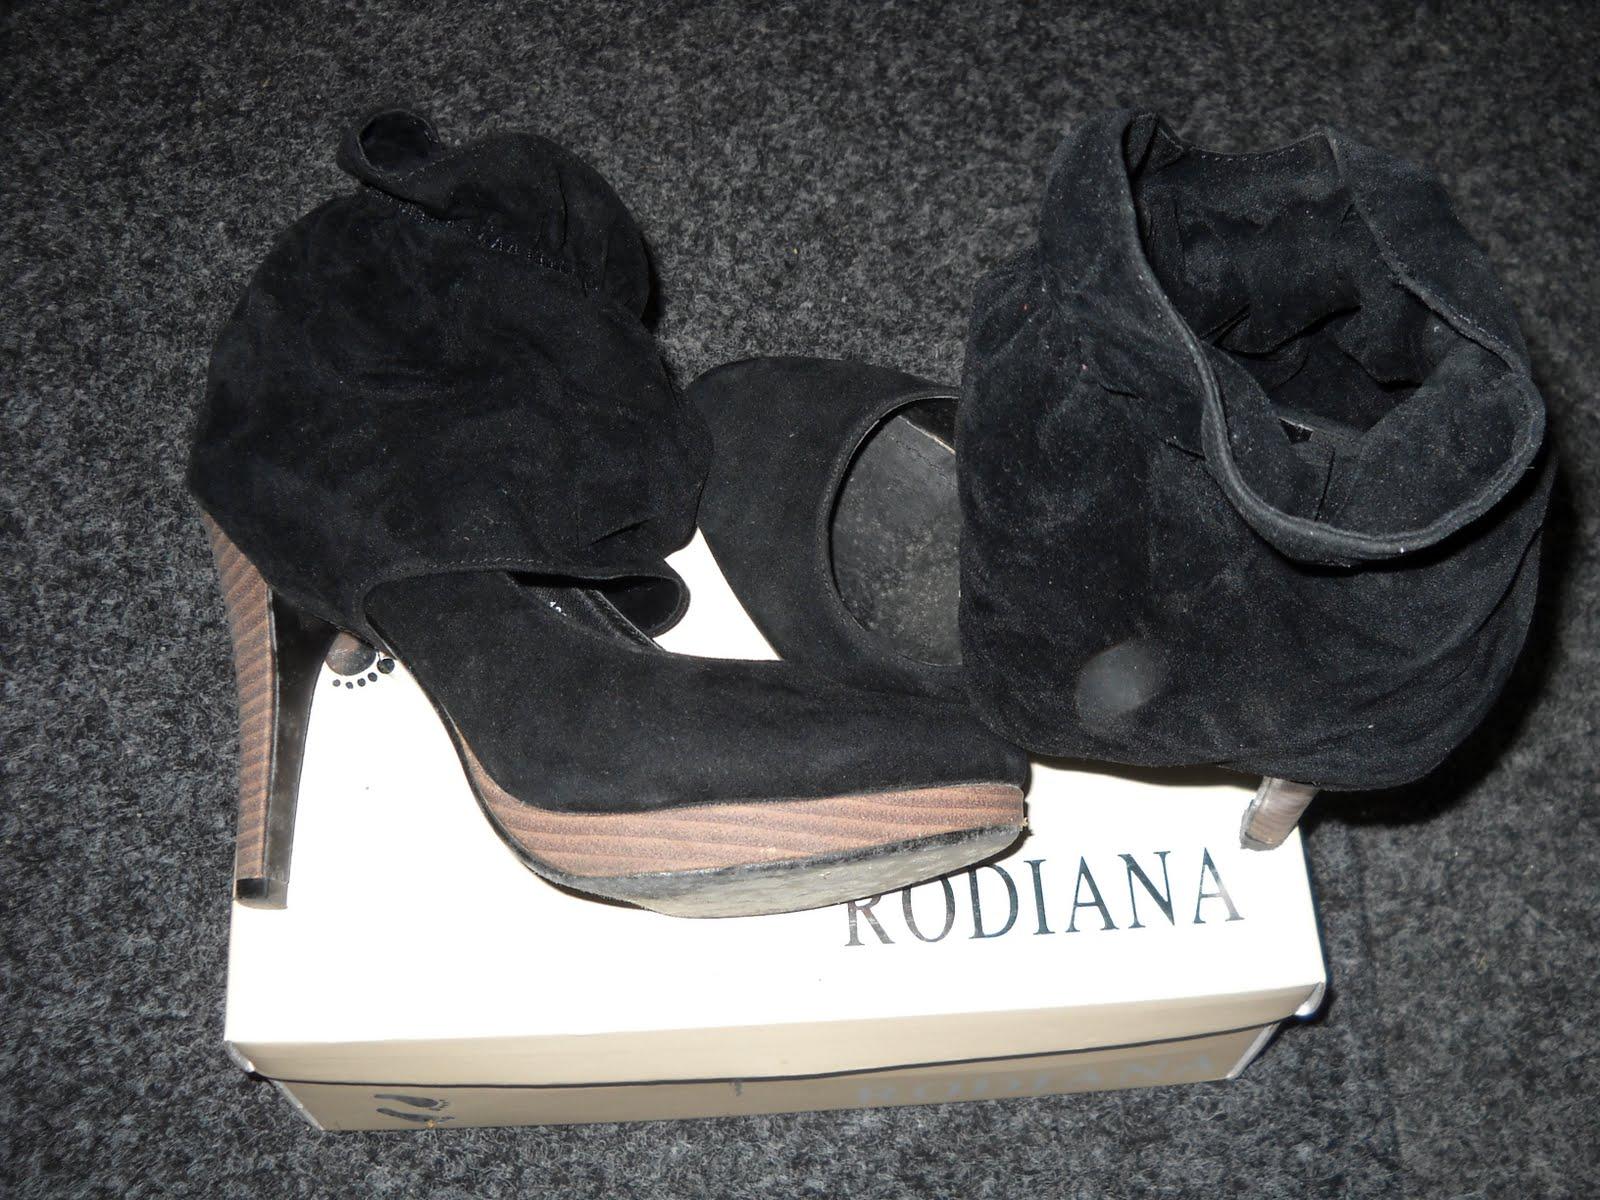 haine la moda si ieftine pantofi negri catifea cu mansete detasabile nr 37. Black Bedroom Furniture Sets. Home Design Ideas